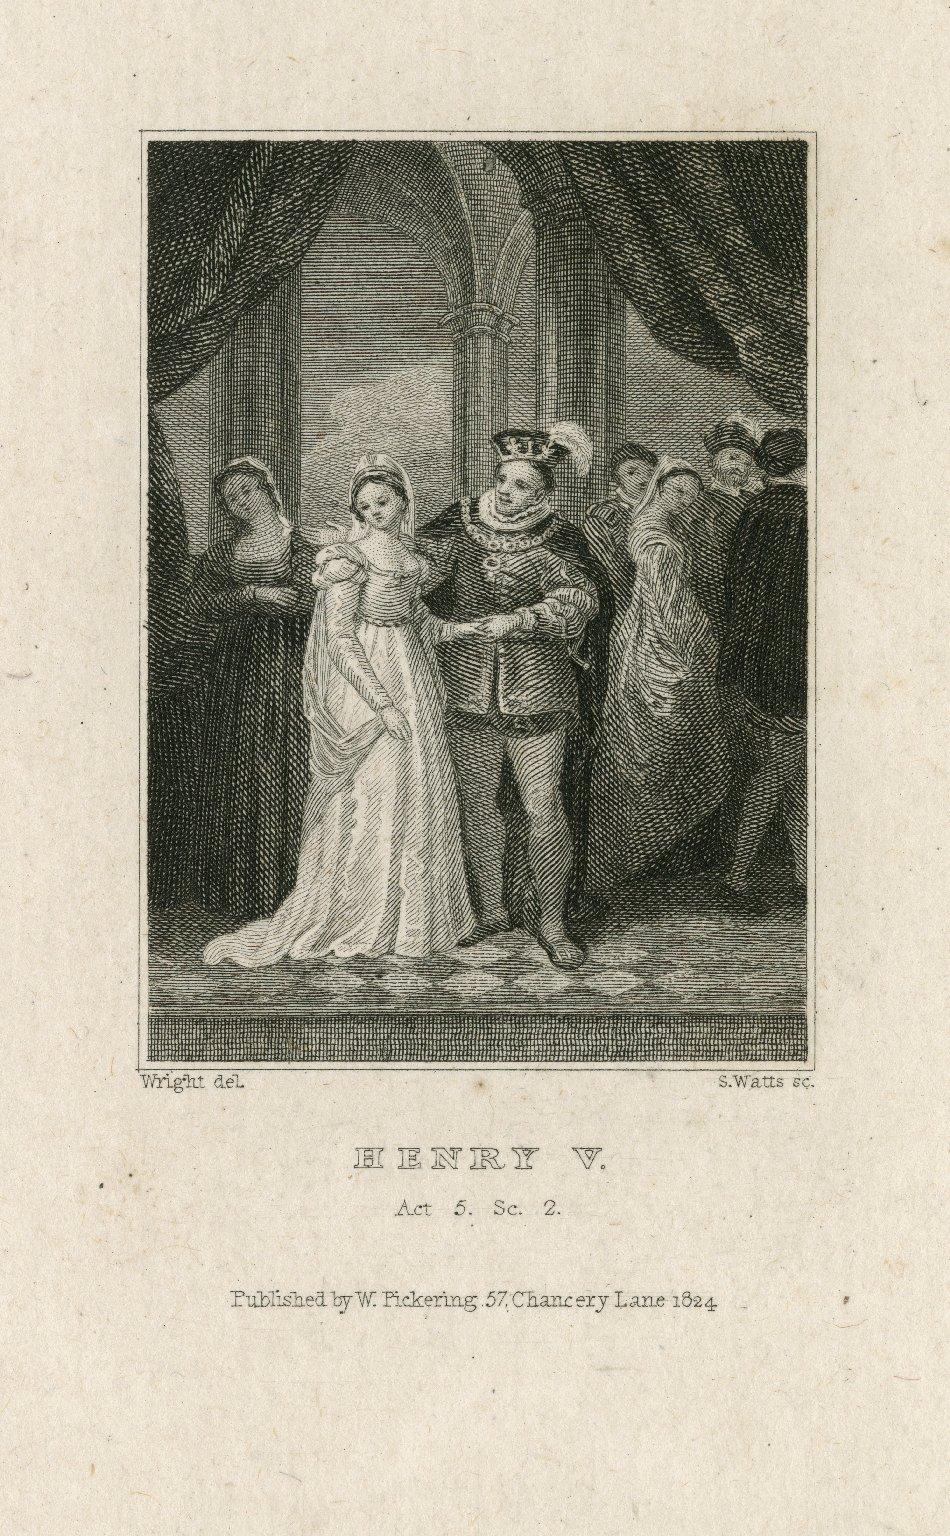 Henry V, Act 5, sc. 2 [graphic] / Wright, del. ; S. Watts, sc.